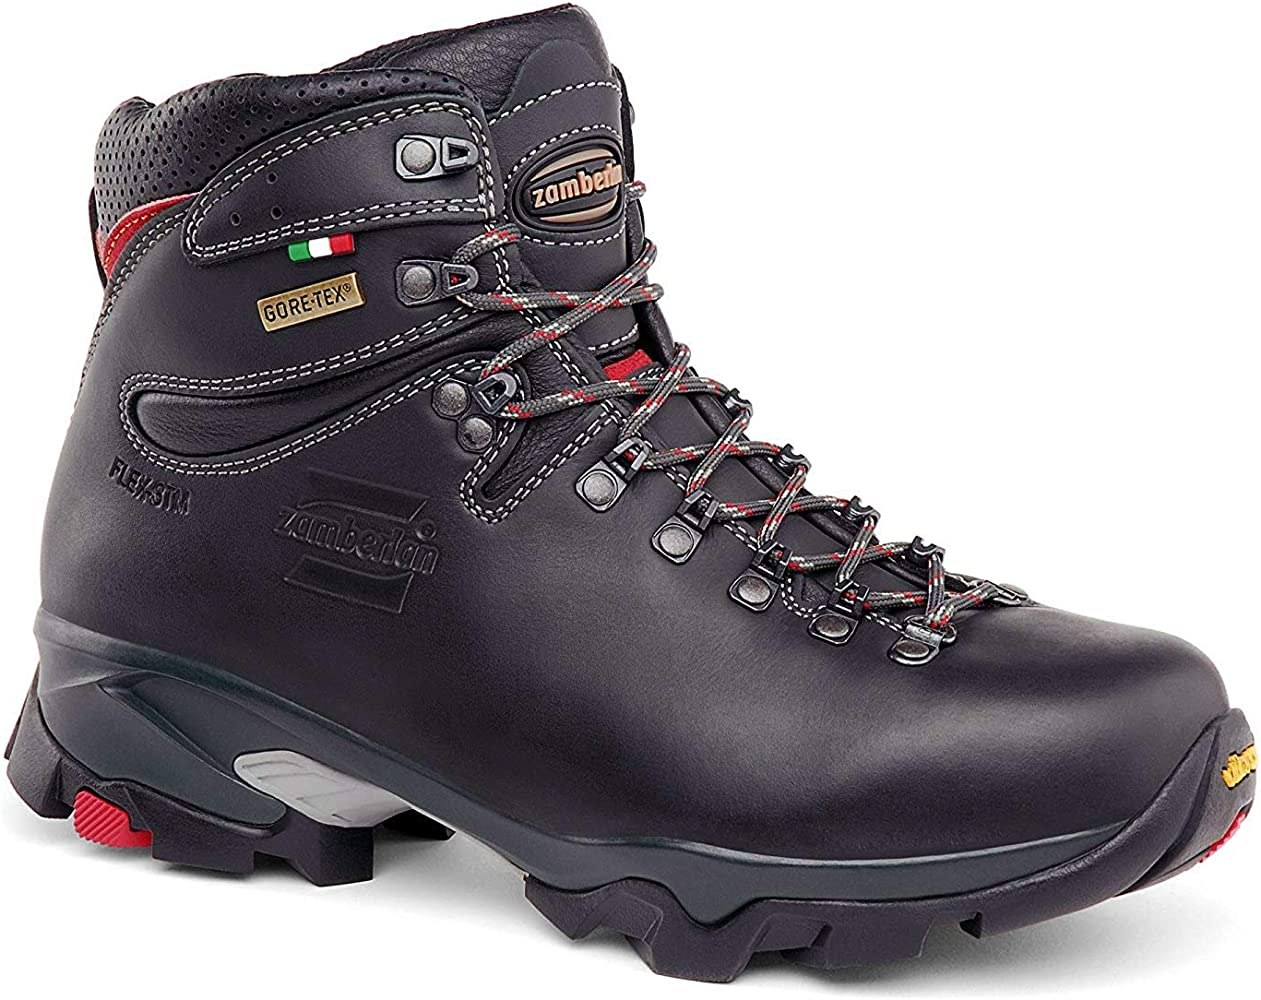 online store factory authentic new release Zamberlan Men's 996 VIOZ Gt Charcoal Walking Boot 996 MNS 7.5 UK ...